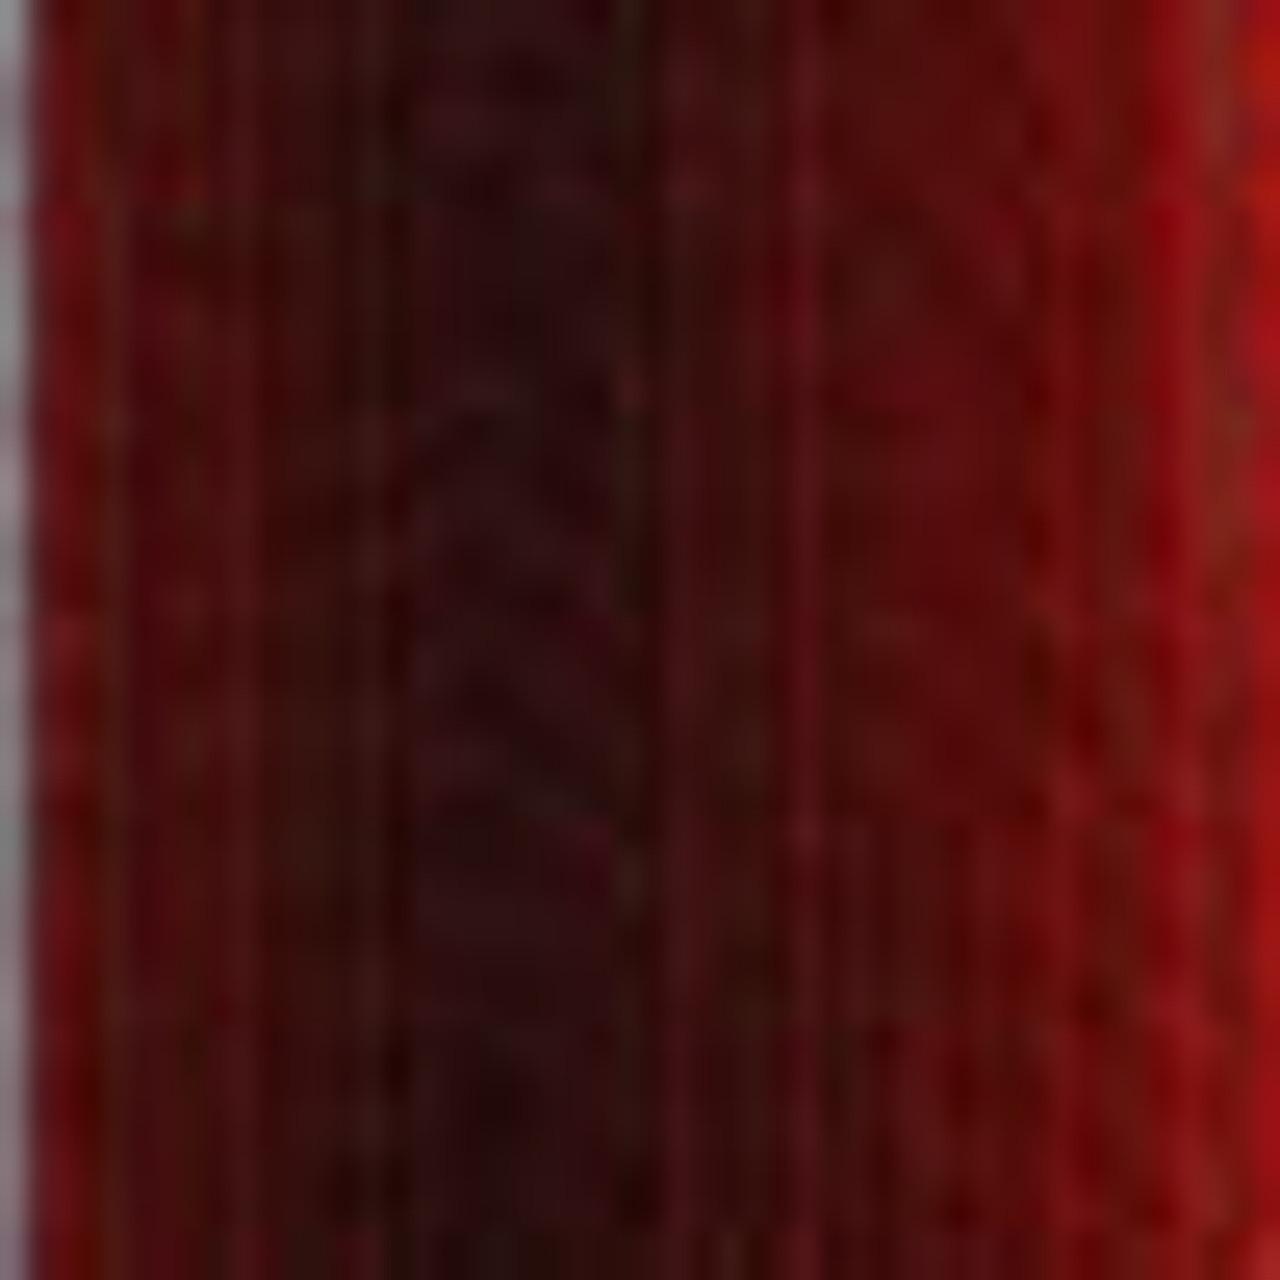 DMC # 115 Variegated Garnet Floss / Thread